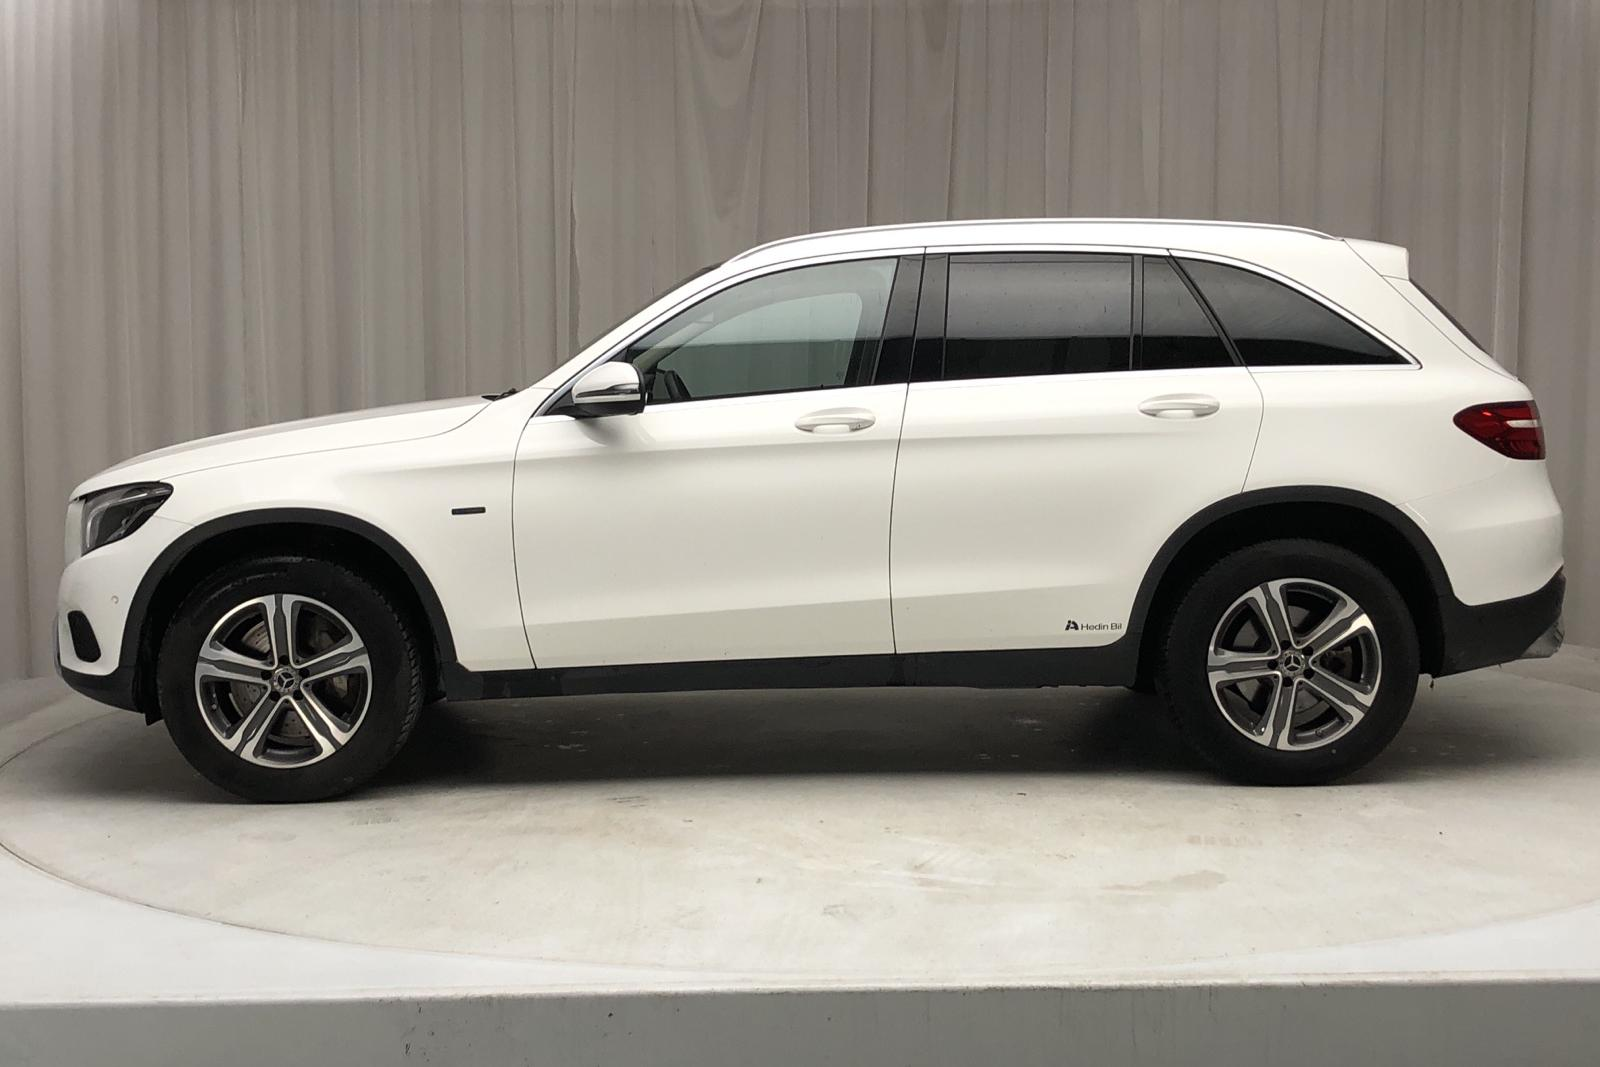 Mercedes GLC 350 e 4MATIC X253 (211hk) - 78 630 km - Automatic - white - 2018